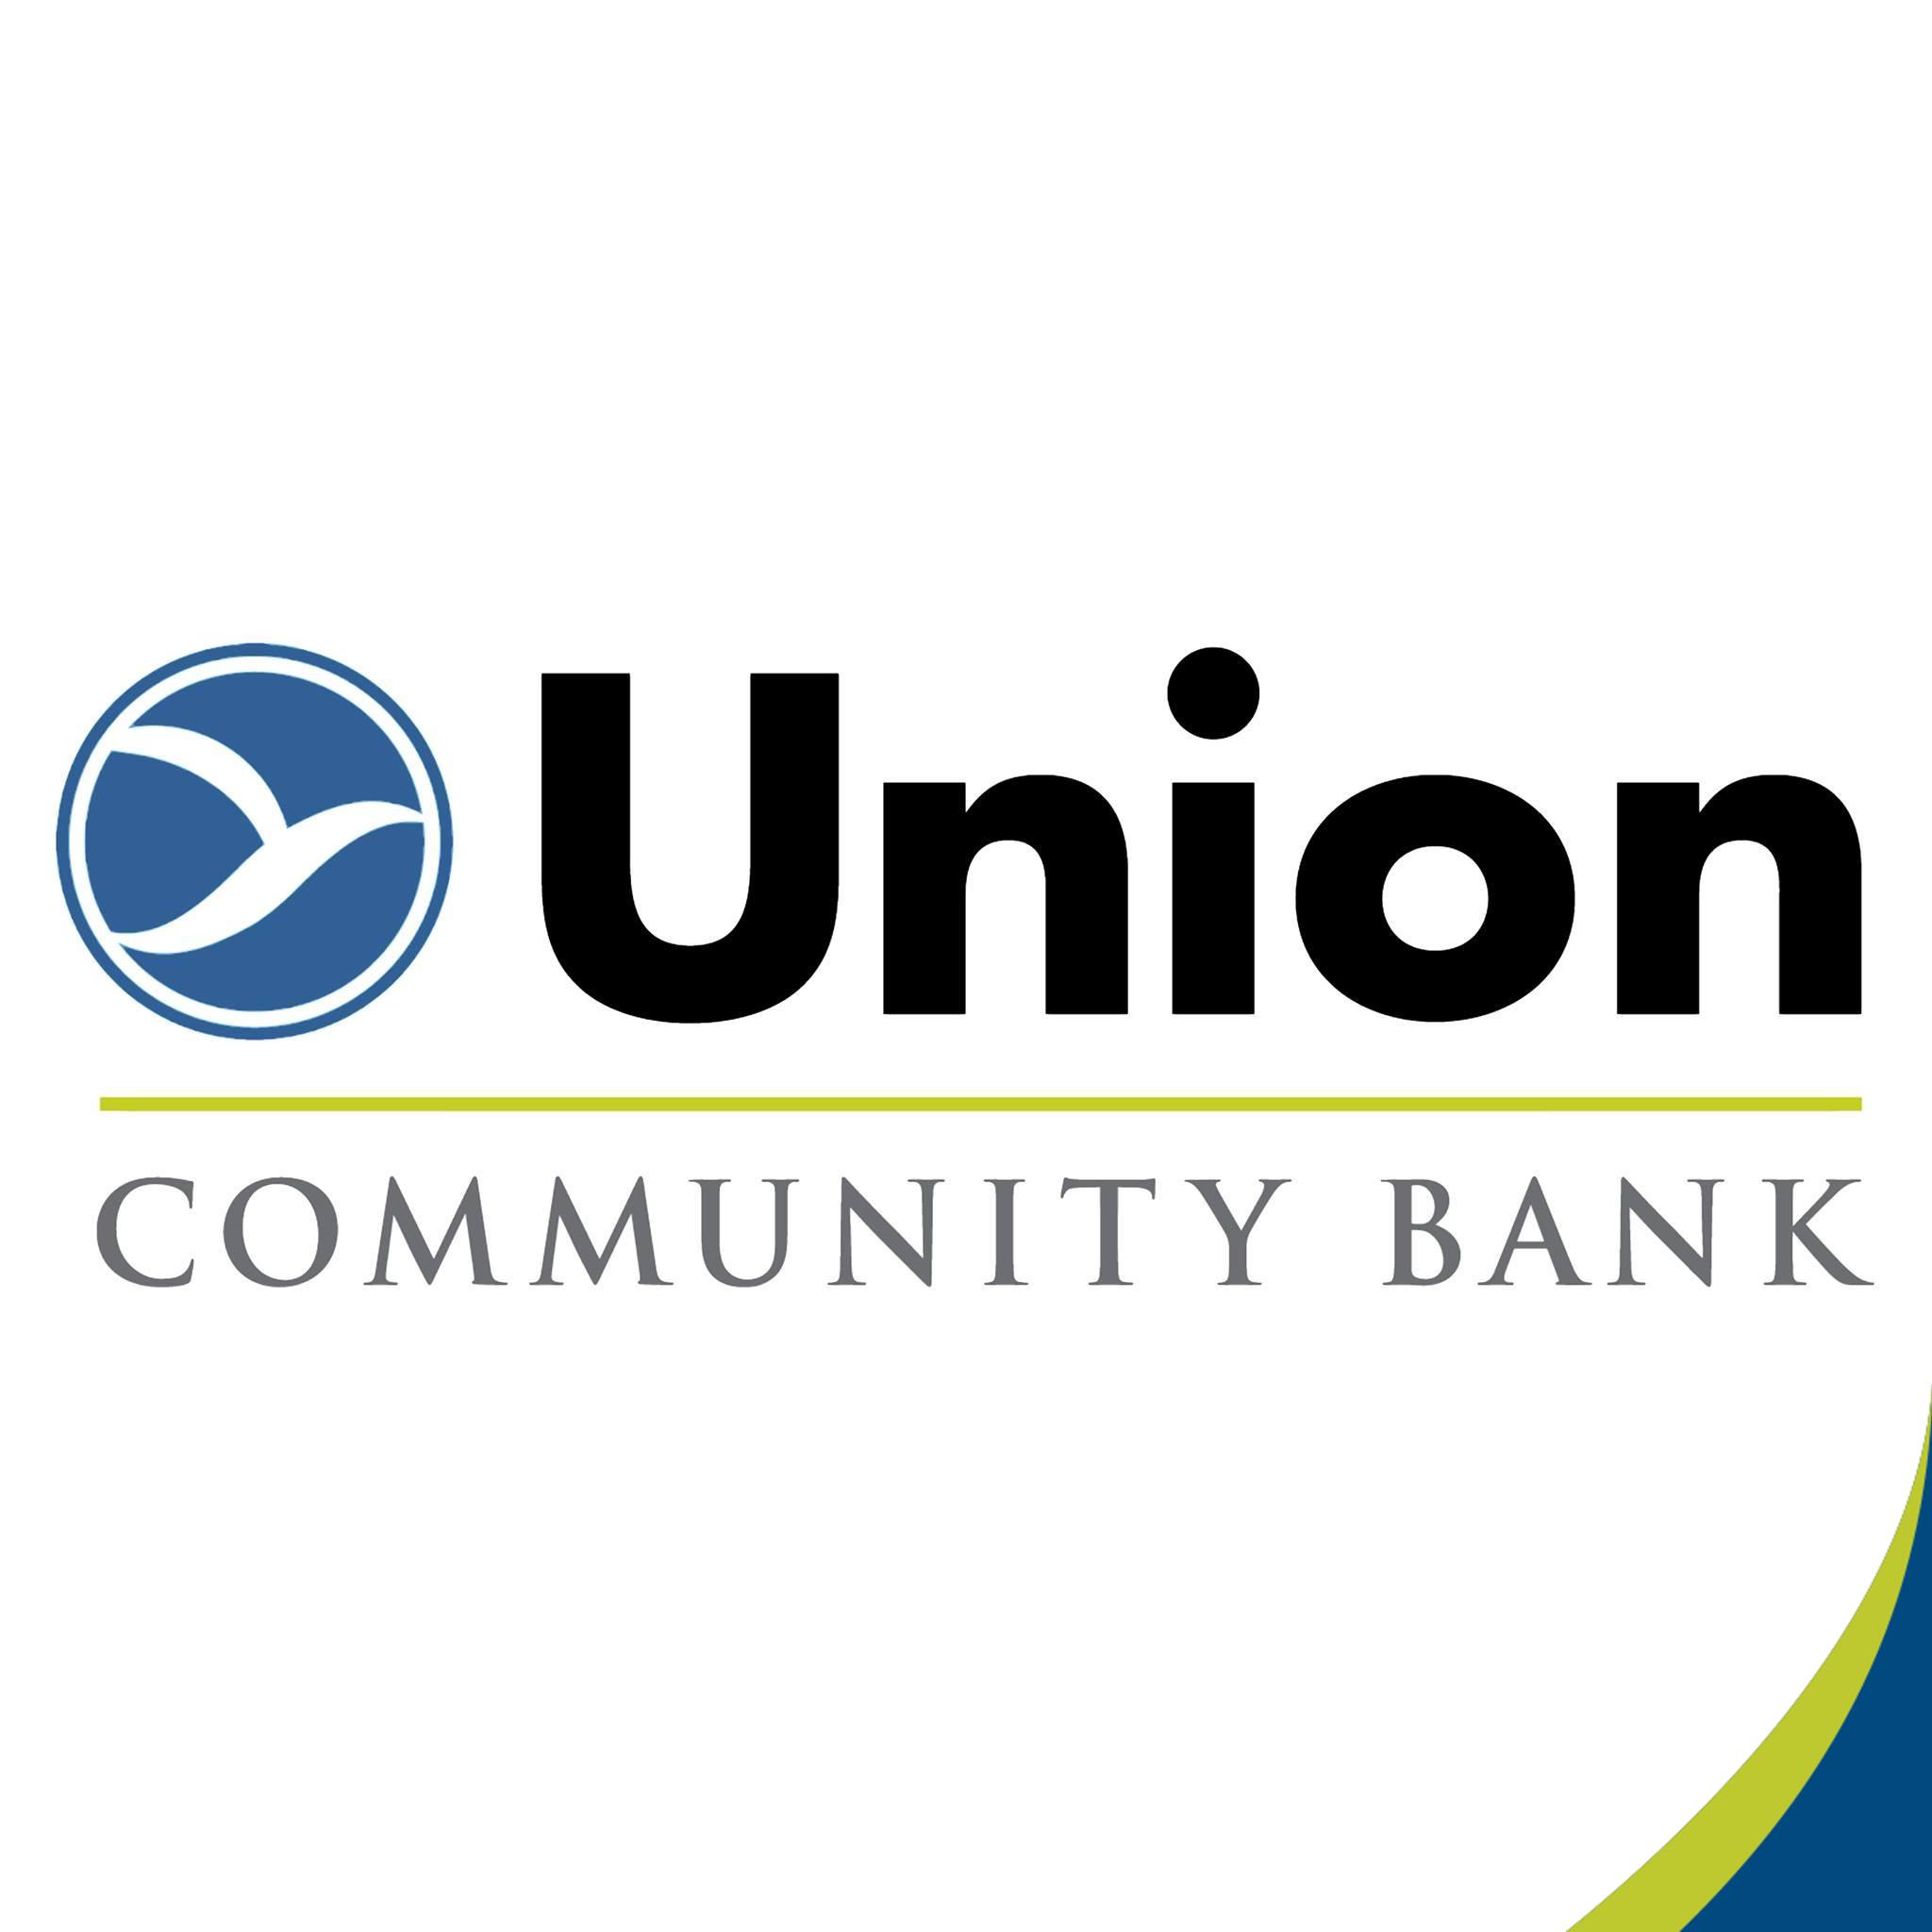 Union Community Bank - HACC - Lancaster, PA - Banking